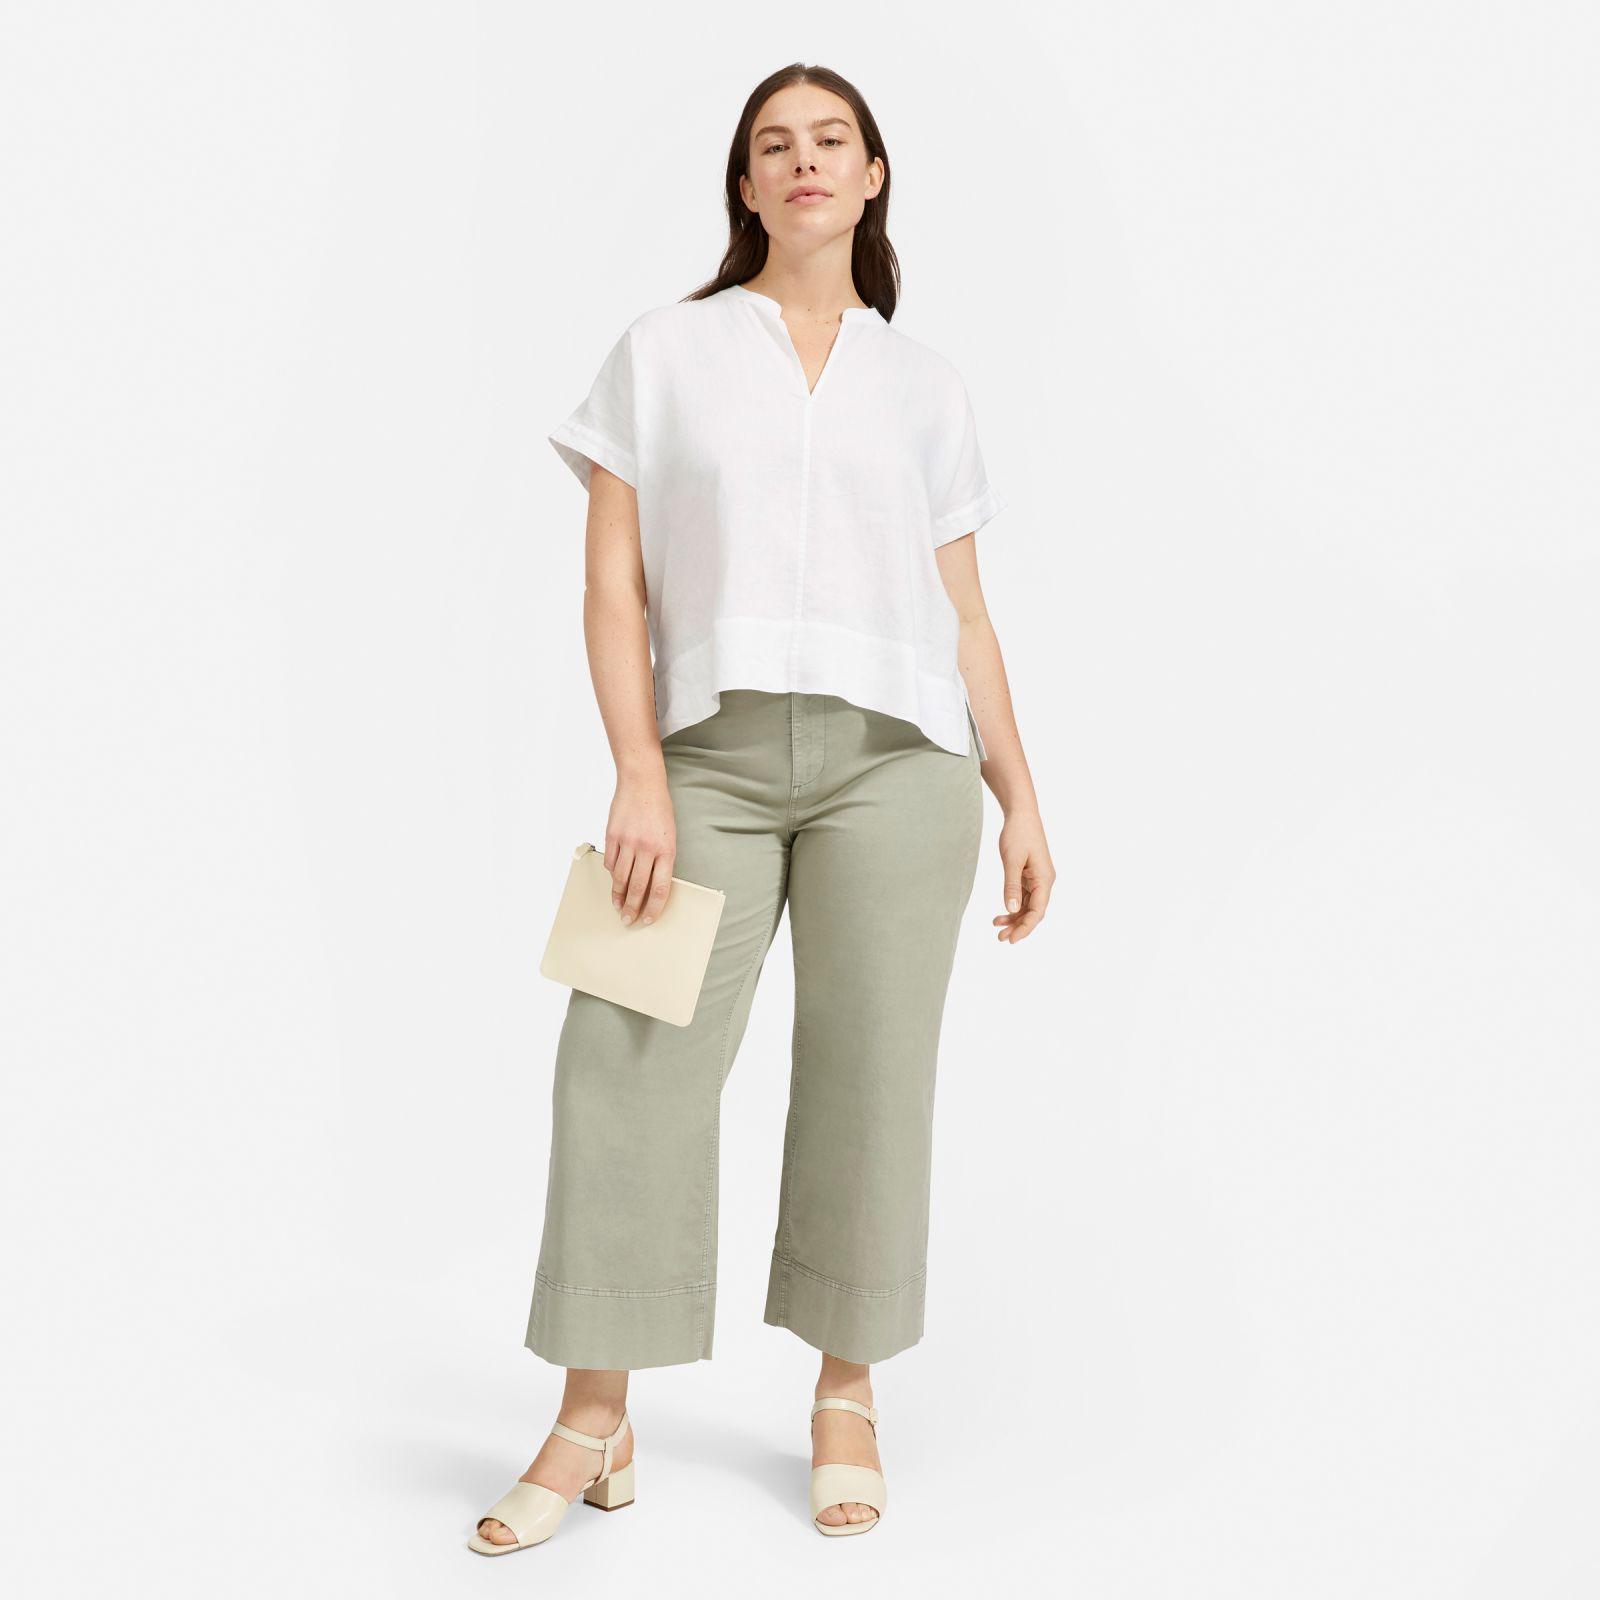 women's linen split-neck top shirt by everlane in white, size 16